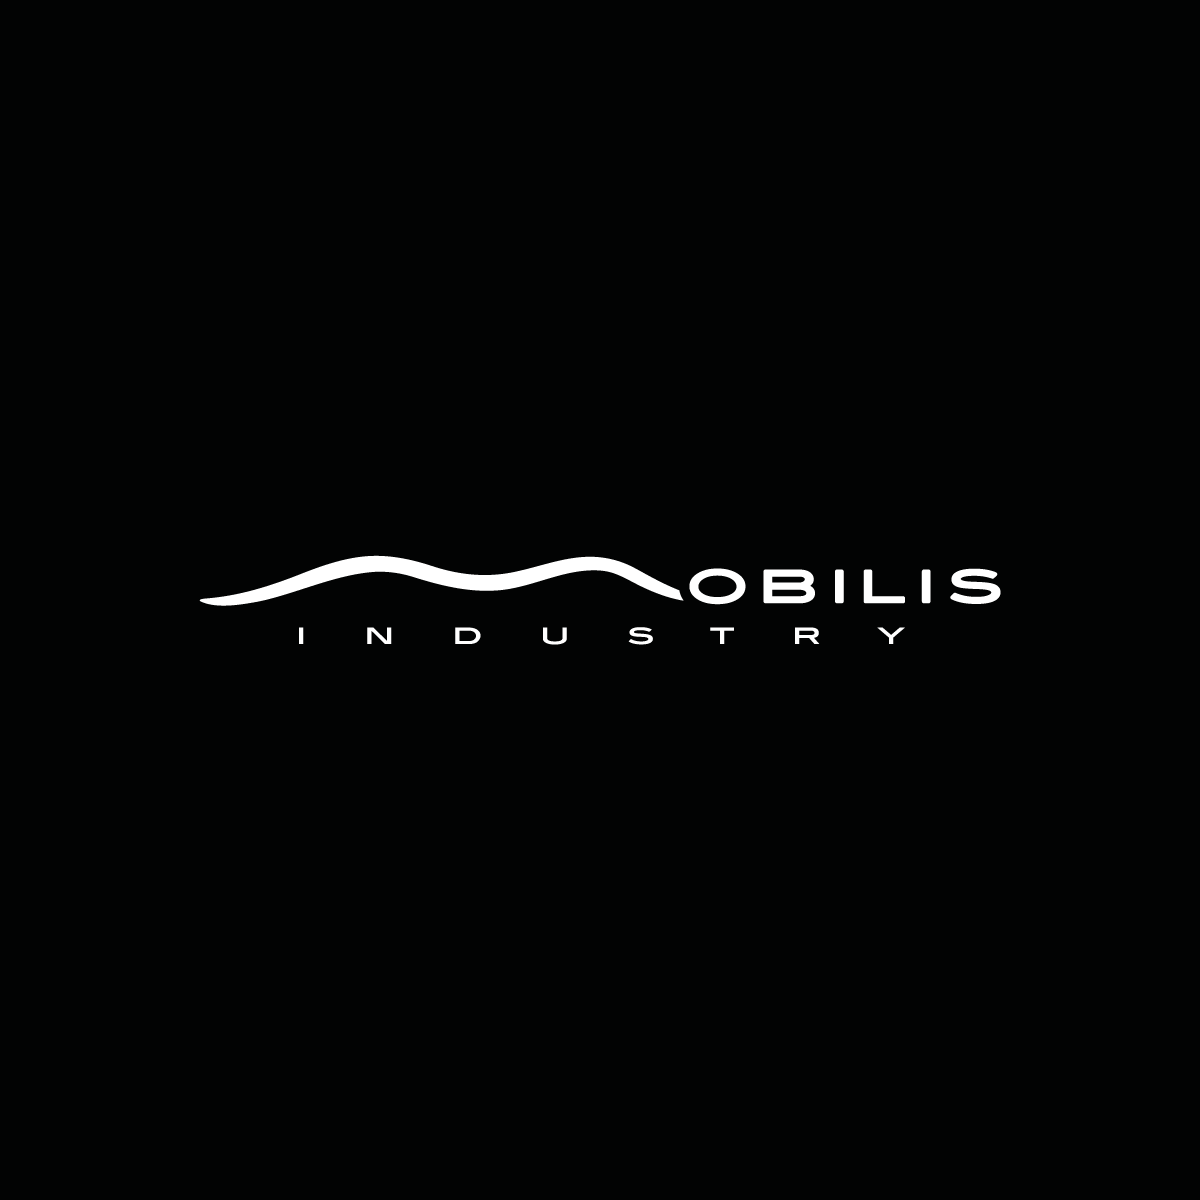 mobilis-industry-logo